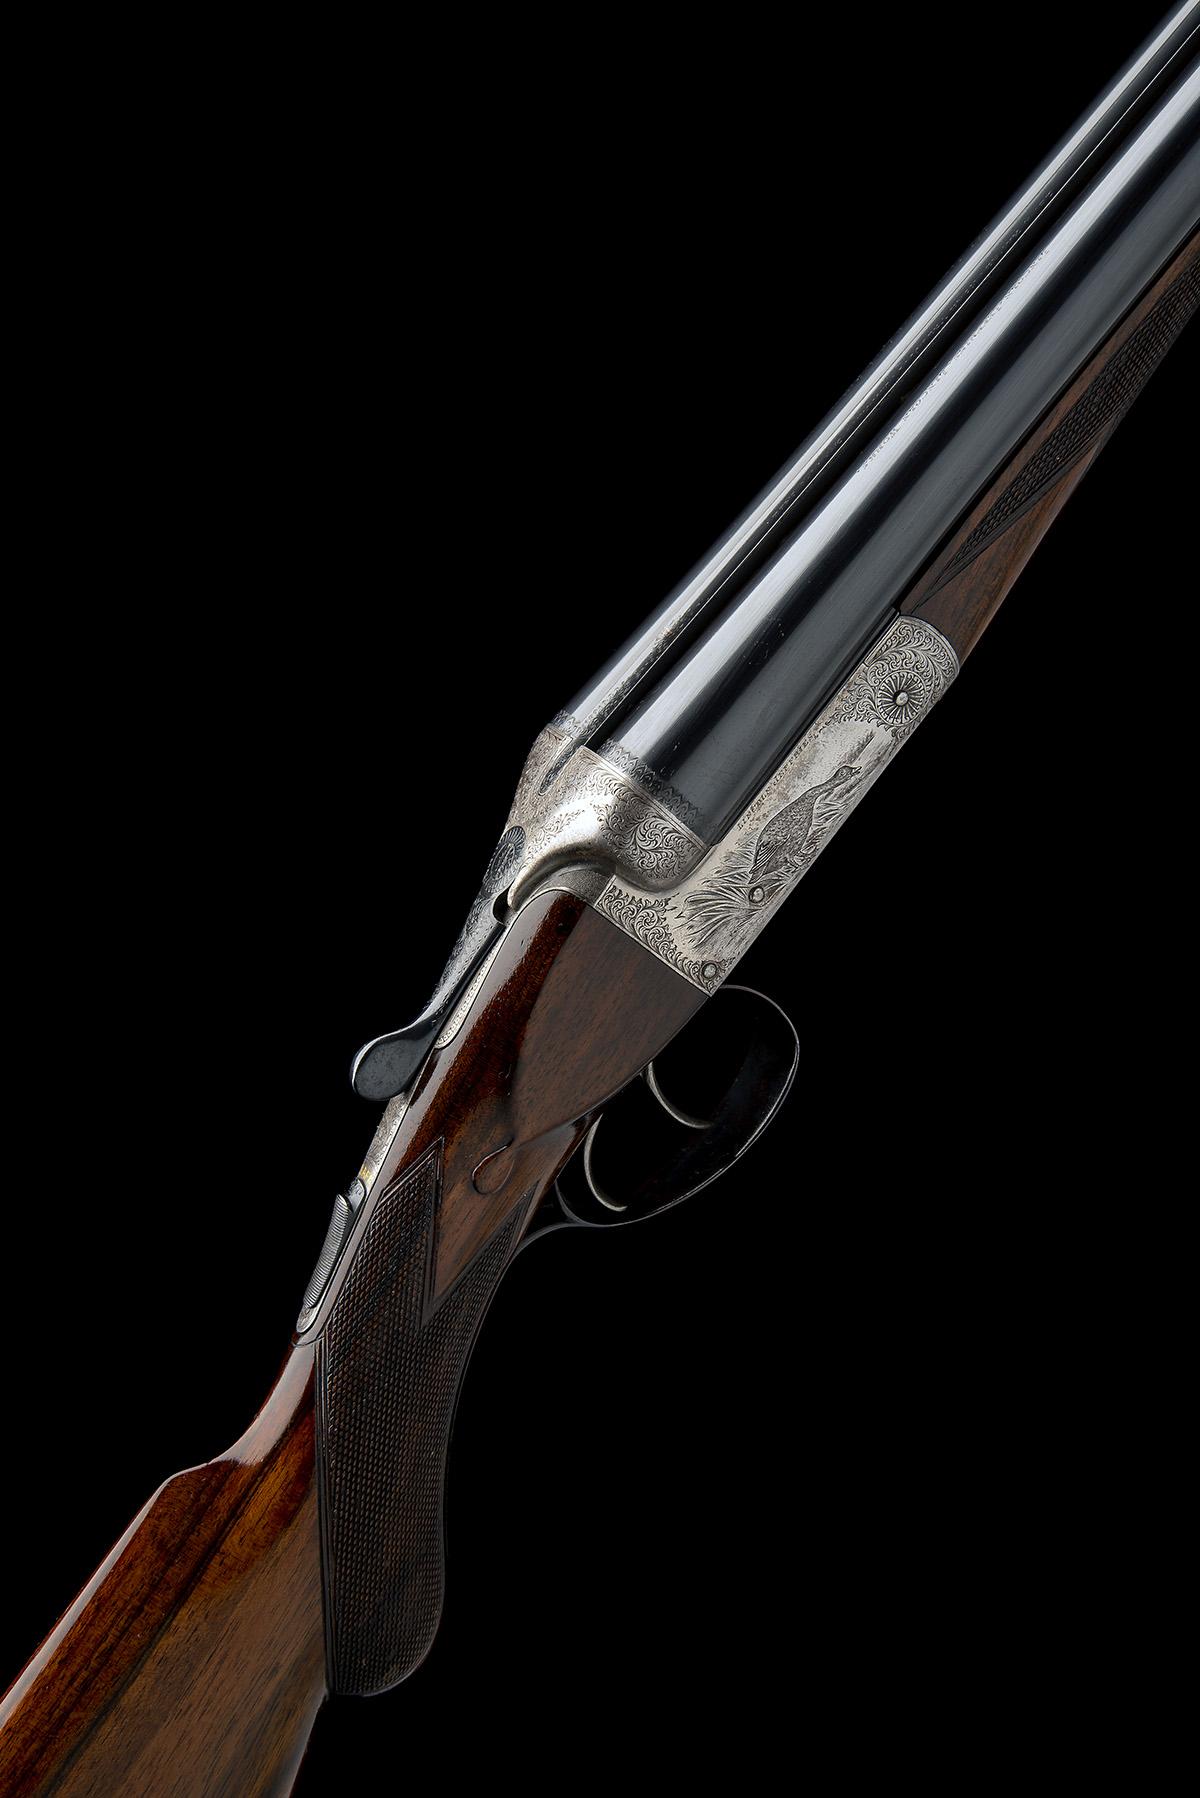 LINCOLN JEFFRIES A 12-BORE (3IN. MAGNUM) 'LONG RANGE HIGH VELOCITY BARRELS GUN' BOXLOCK NON-